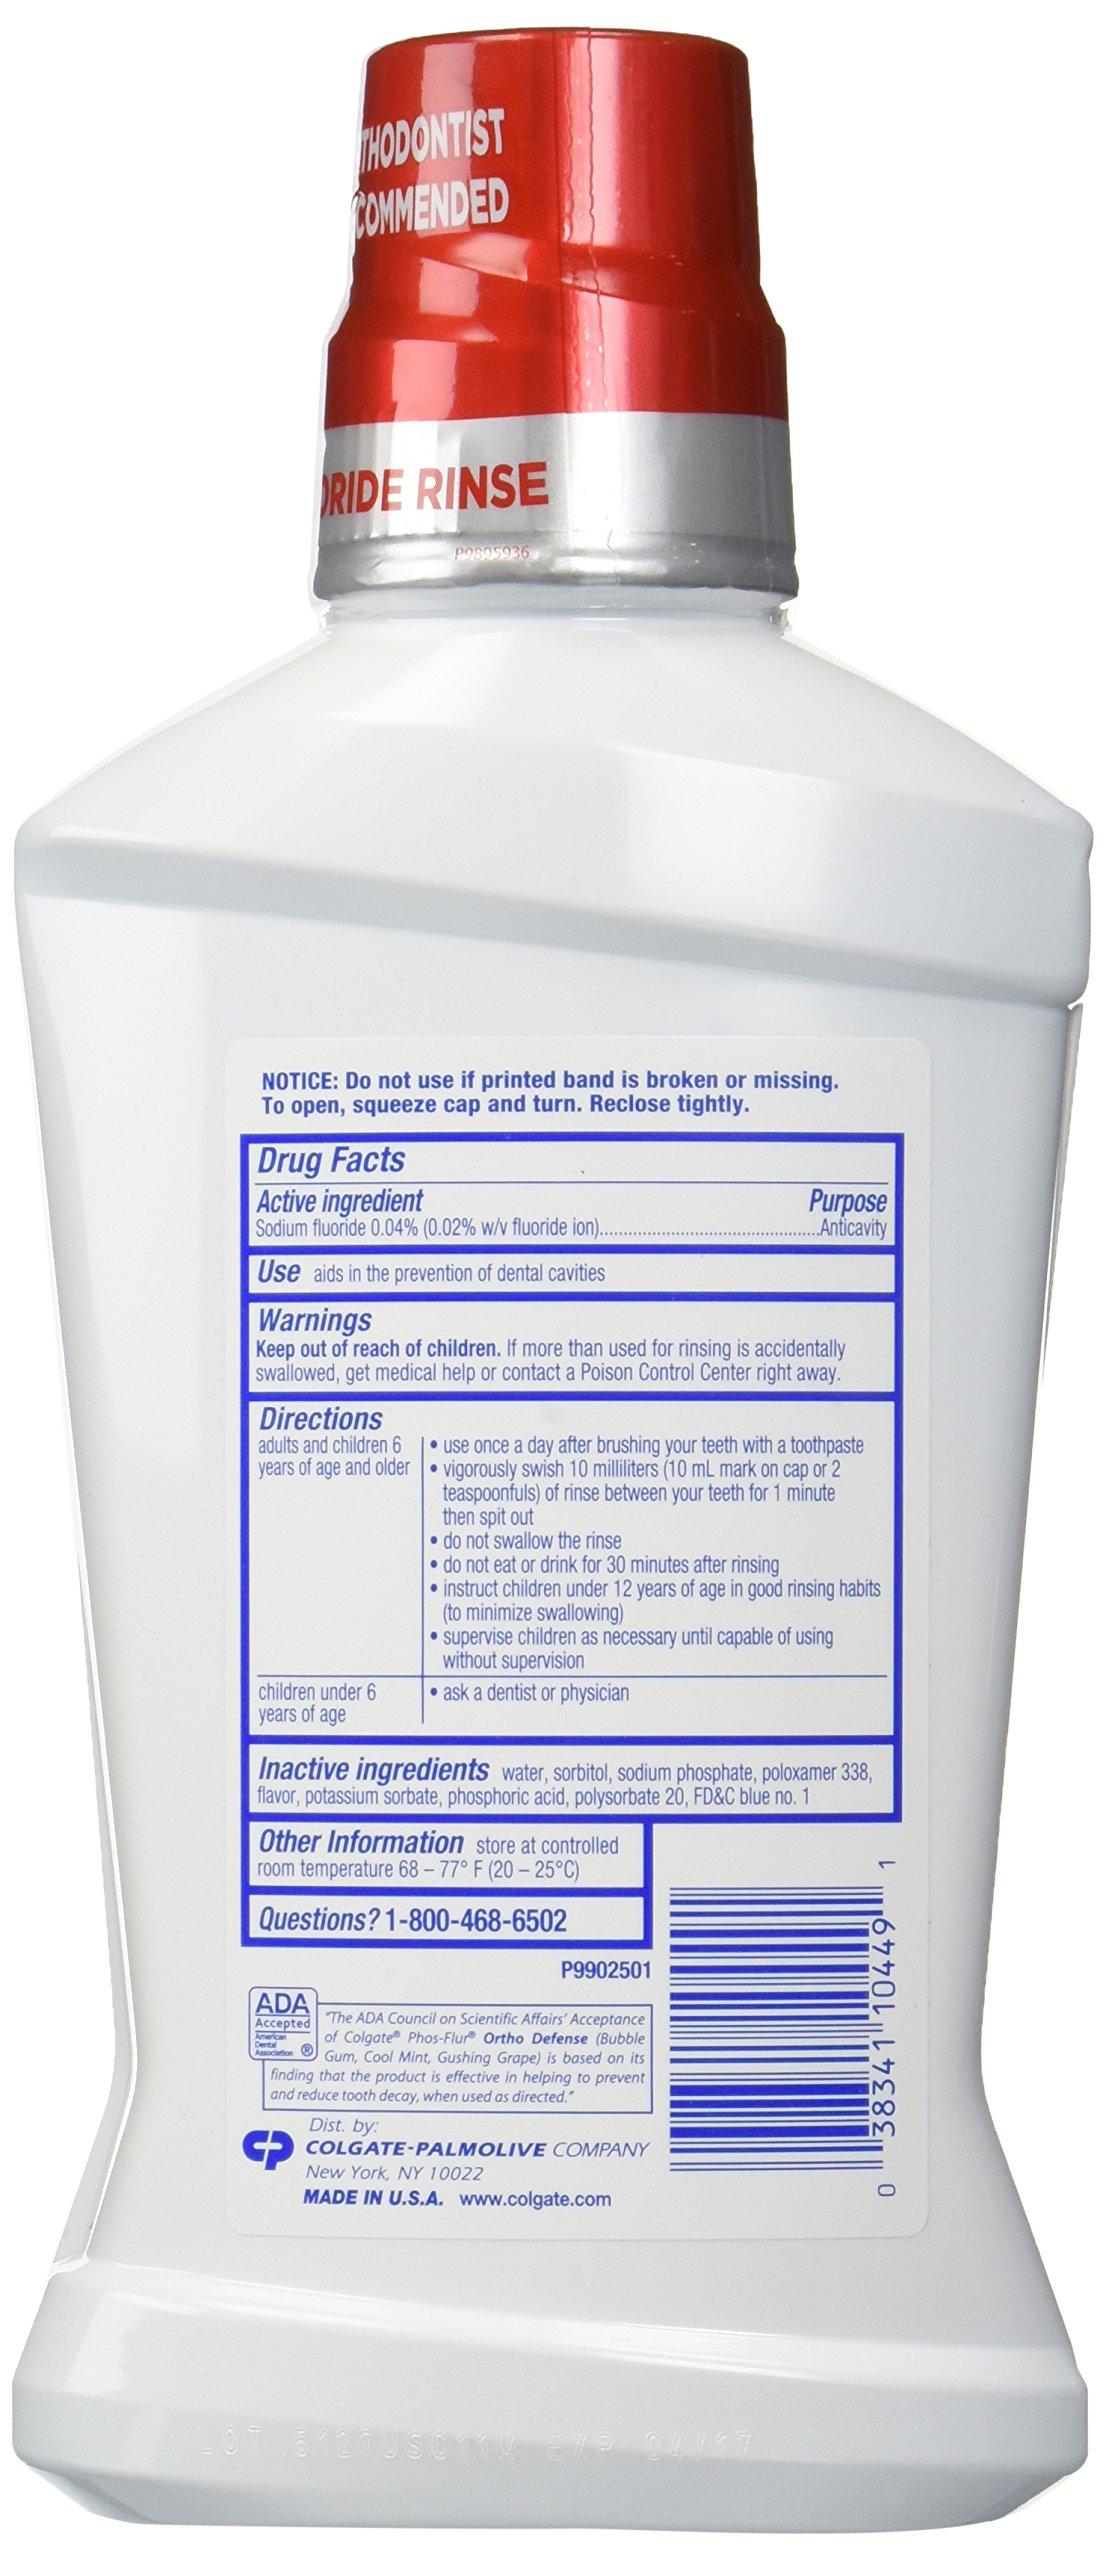 Colgate Phos Flur Anti Cavity Fluoride Rinse, Mint, 16.9 Ounce by Phos Flur (Image #4)